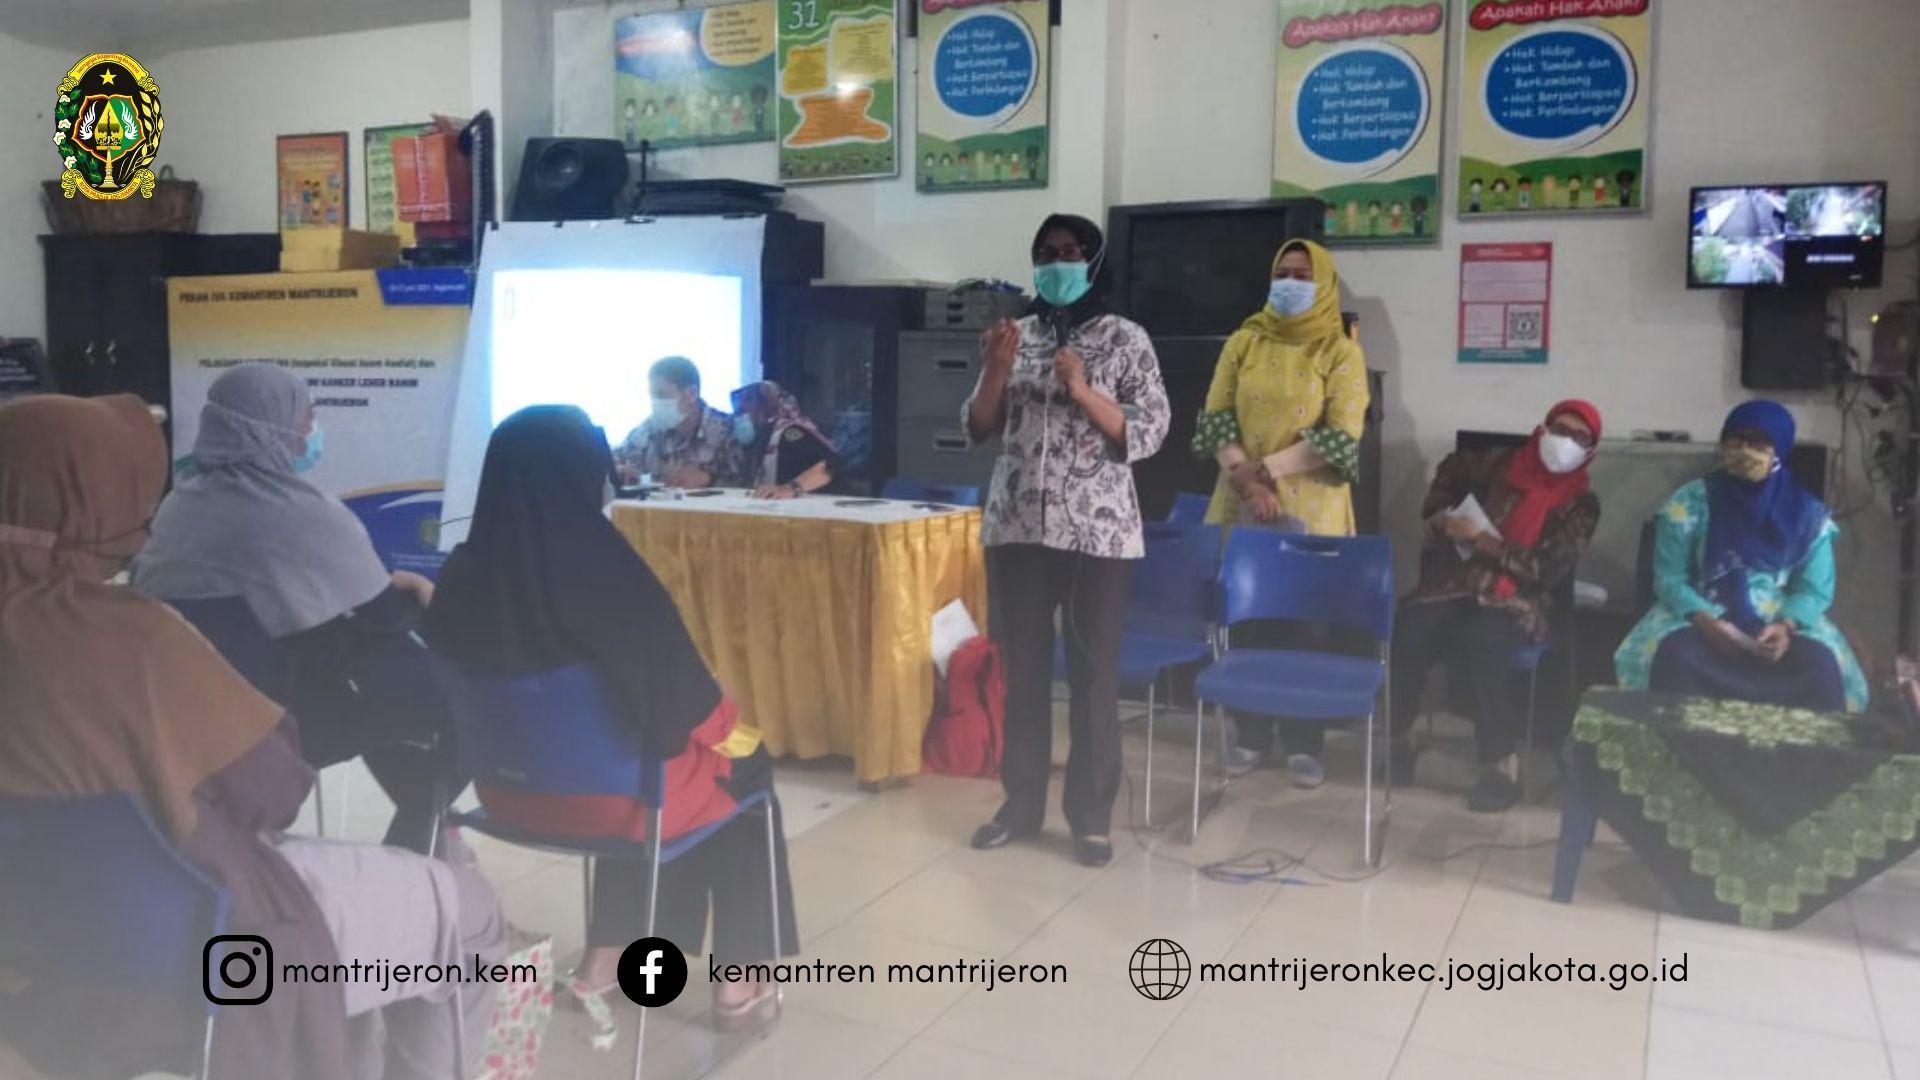 Roadshow Penyuluhan IVA di Dapur Balita RW 08 Kelurahan Mantrijeron